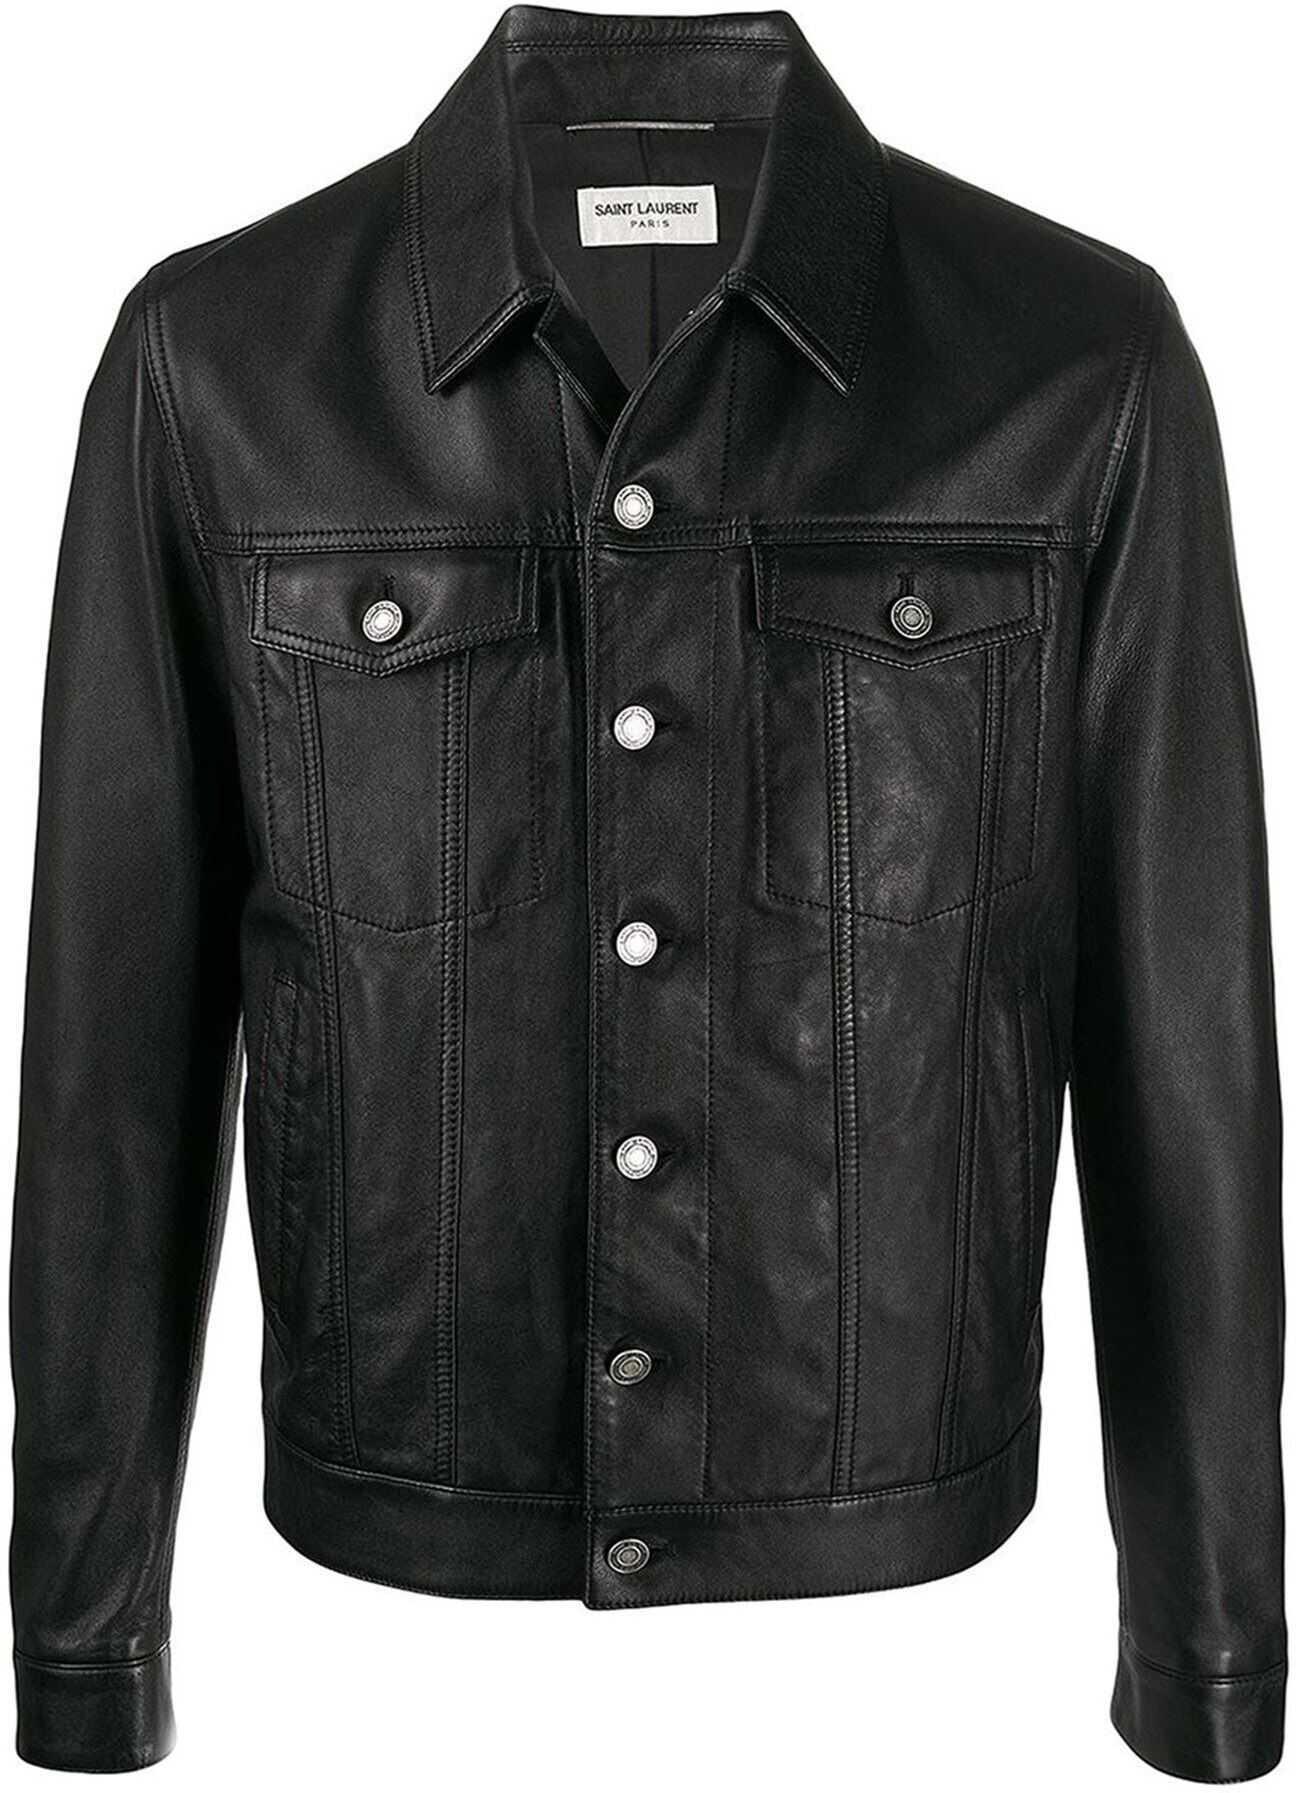 Saint Laurent Napa Leather Jacket In Black Black imagine